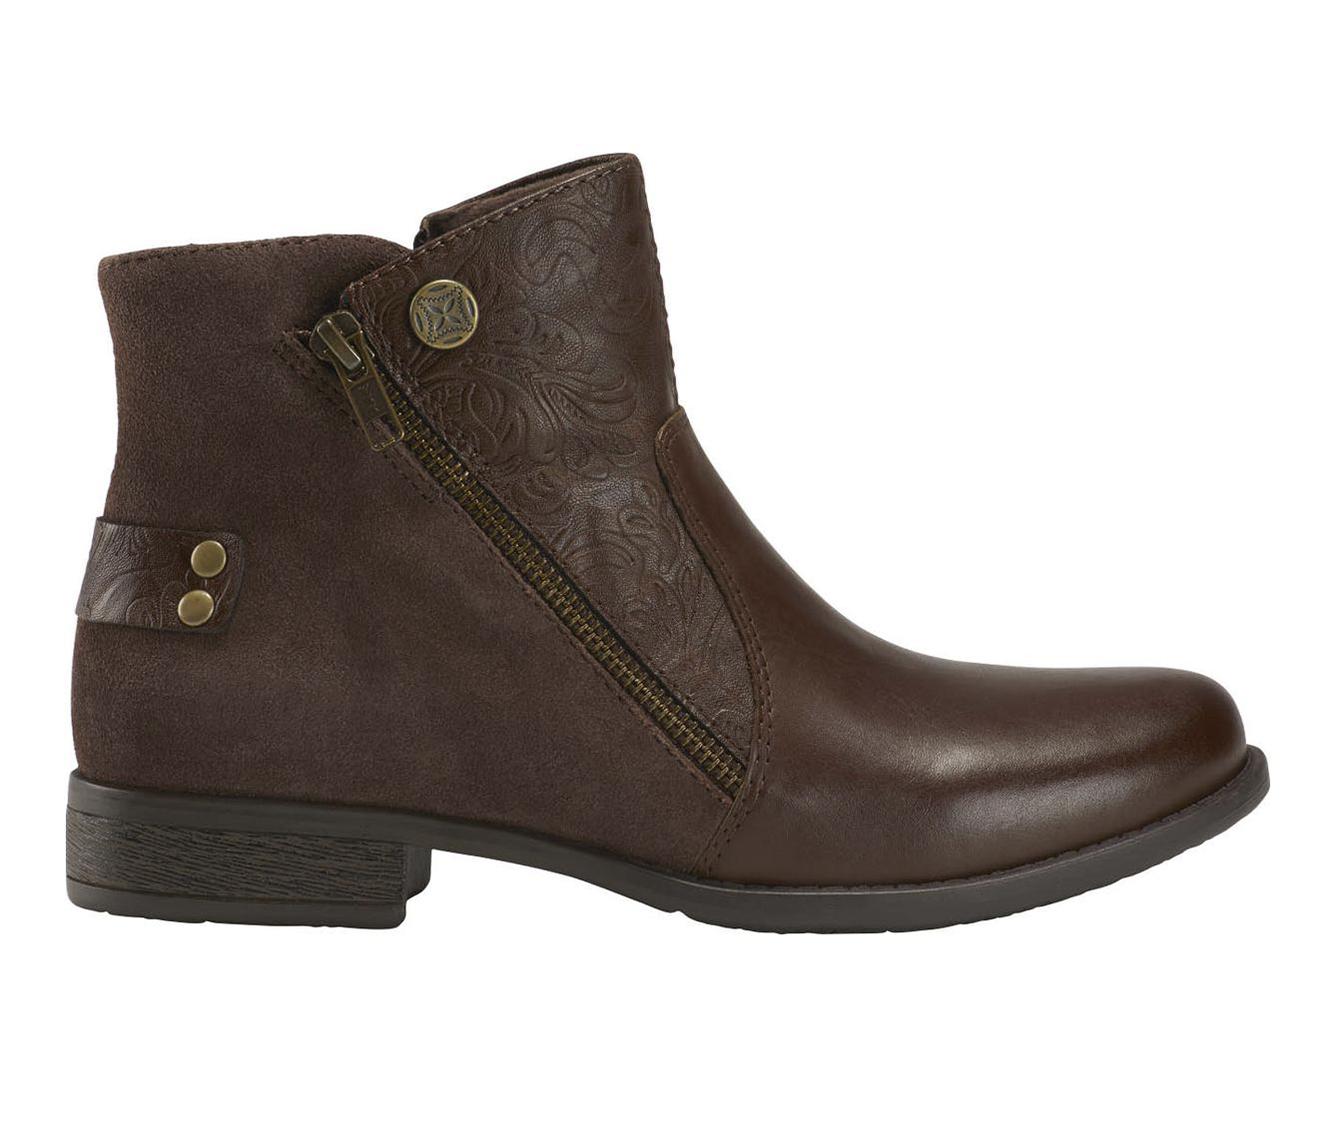 Earth Origins Navigate Noah Women's Boots (Brown - Leather)